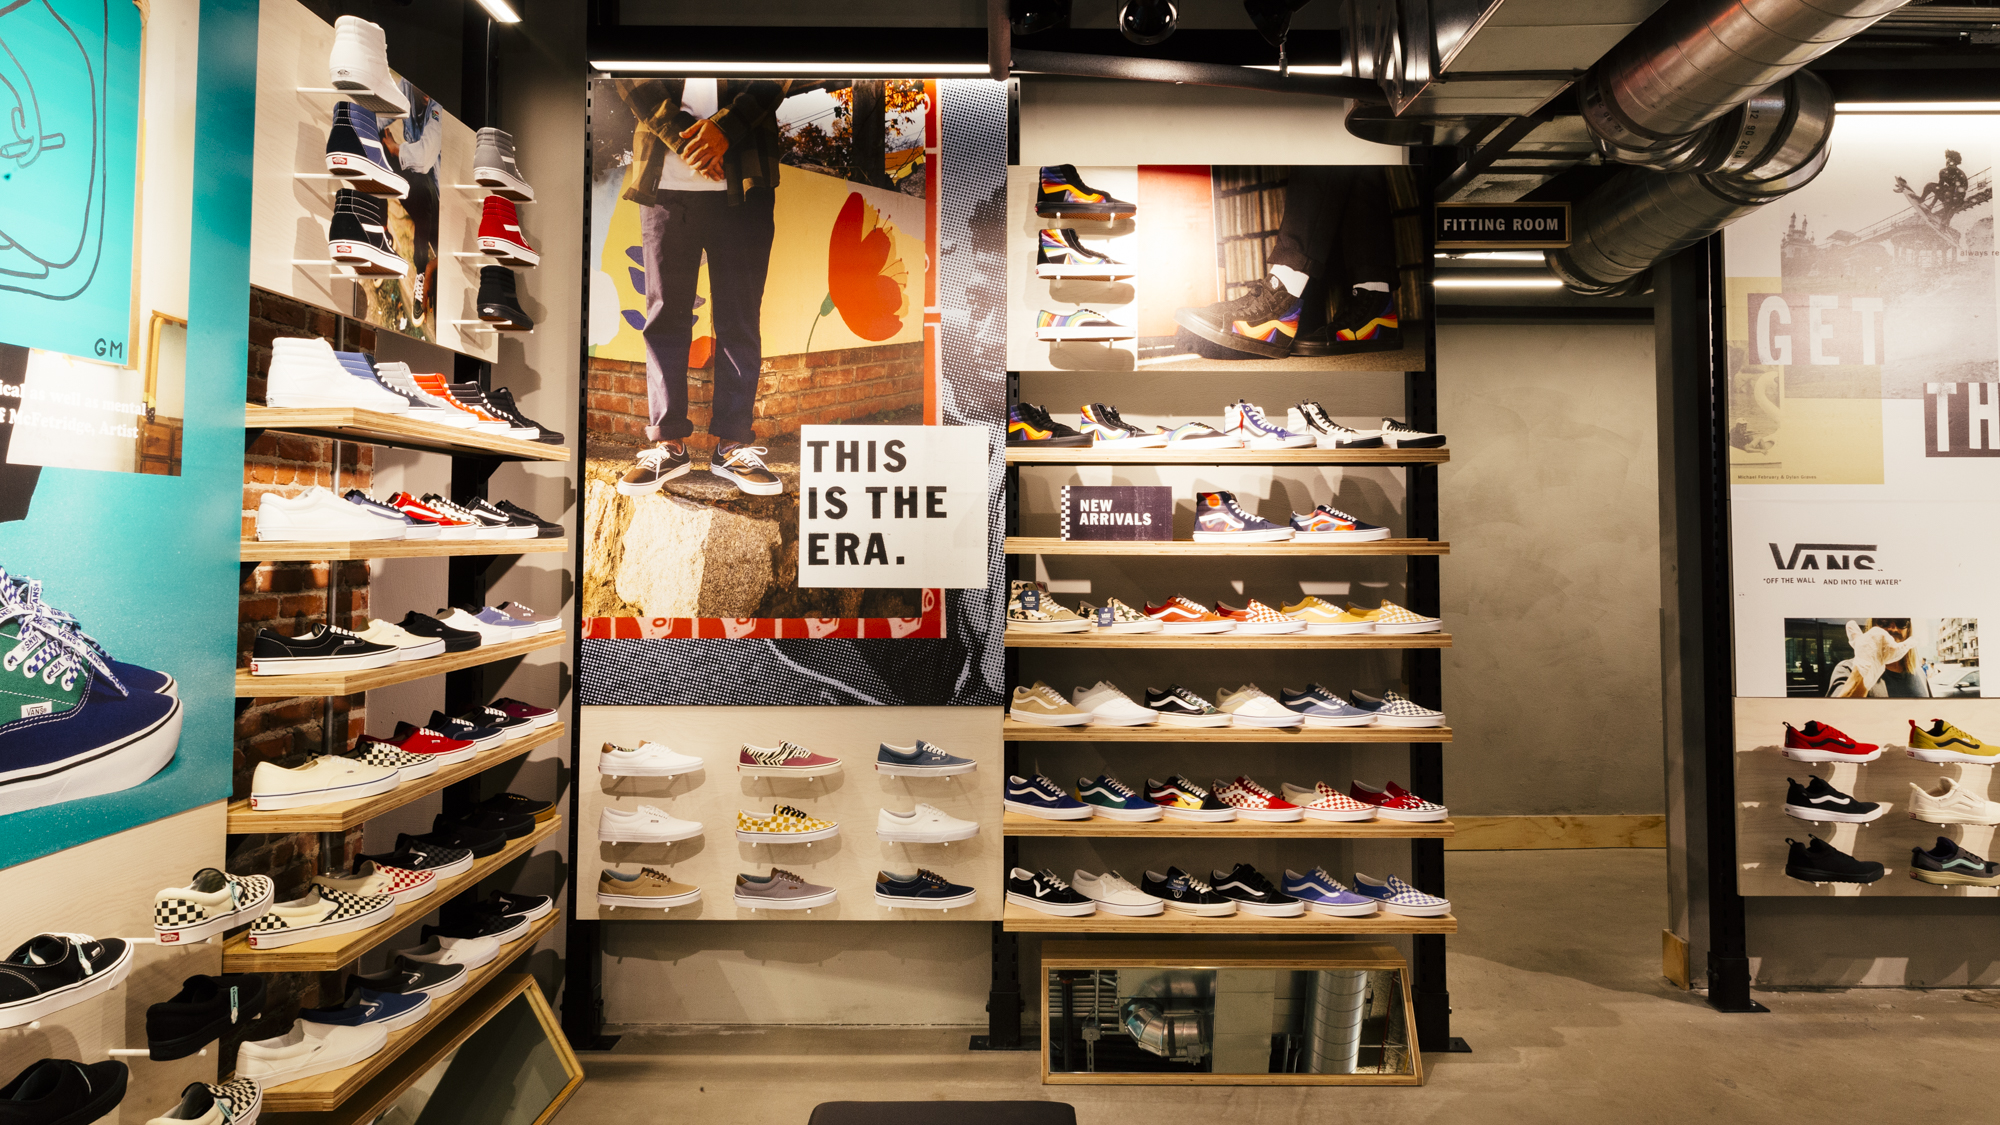 Contracción Disciplina Destilar  Vans Open New Store in Downtown LA | Shop-Eat-Surf